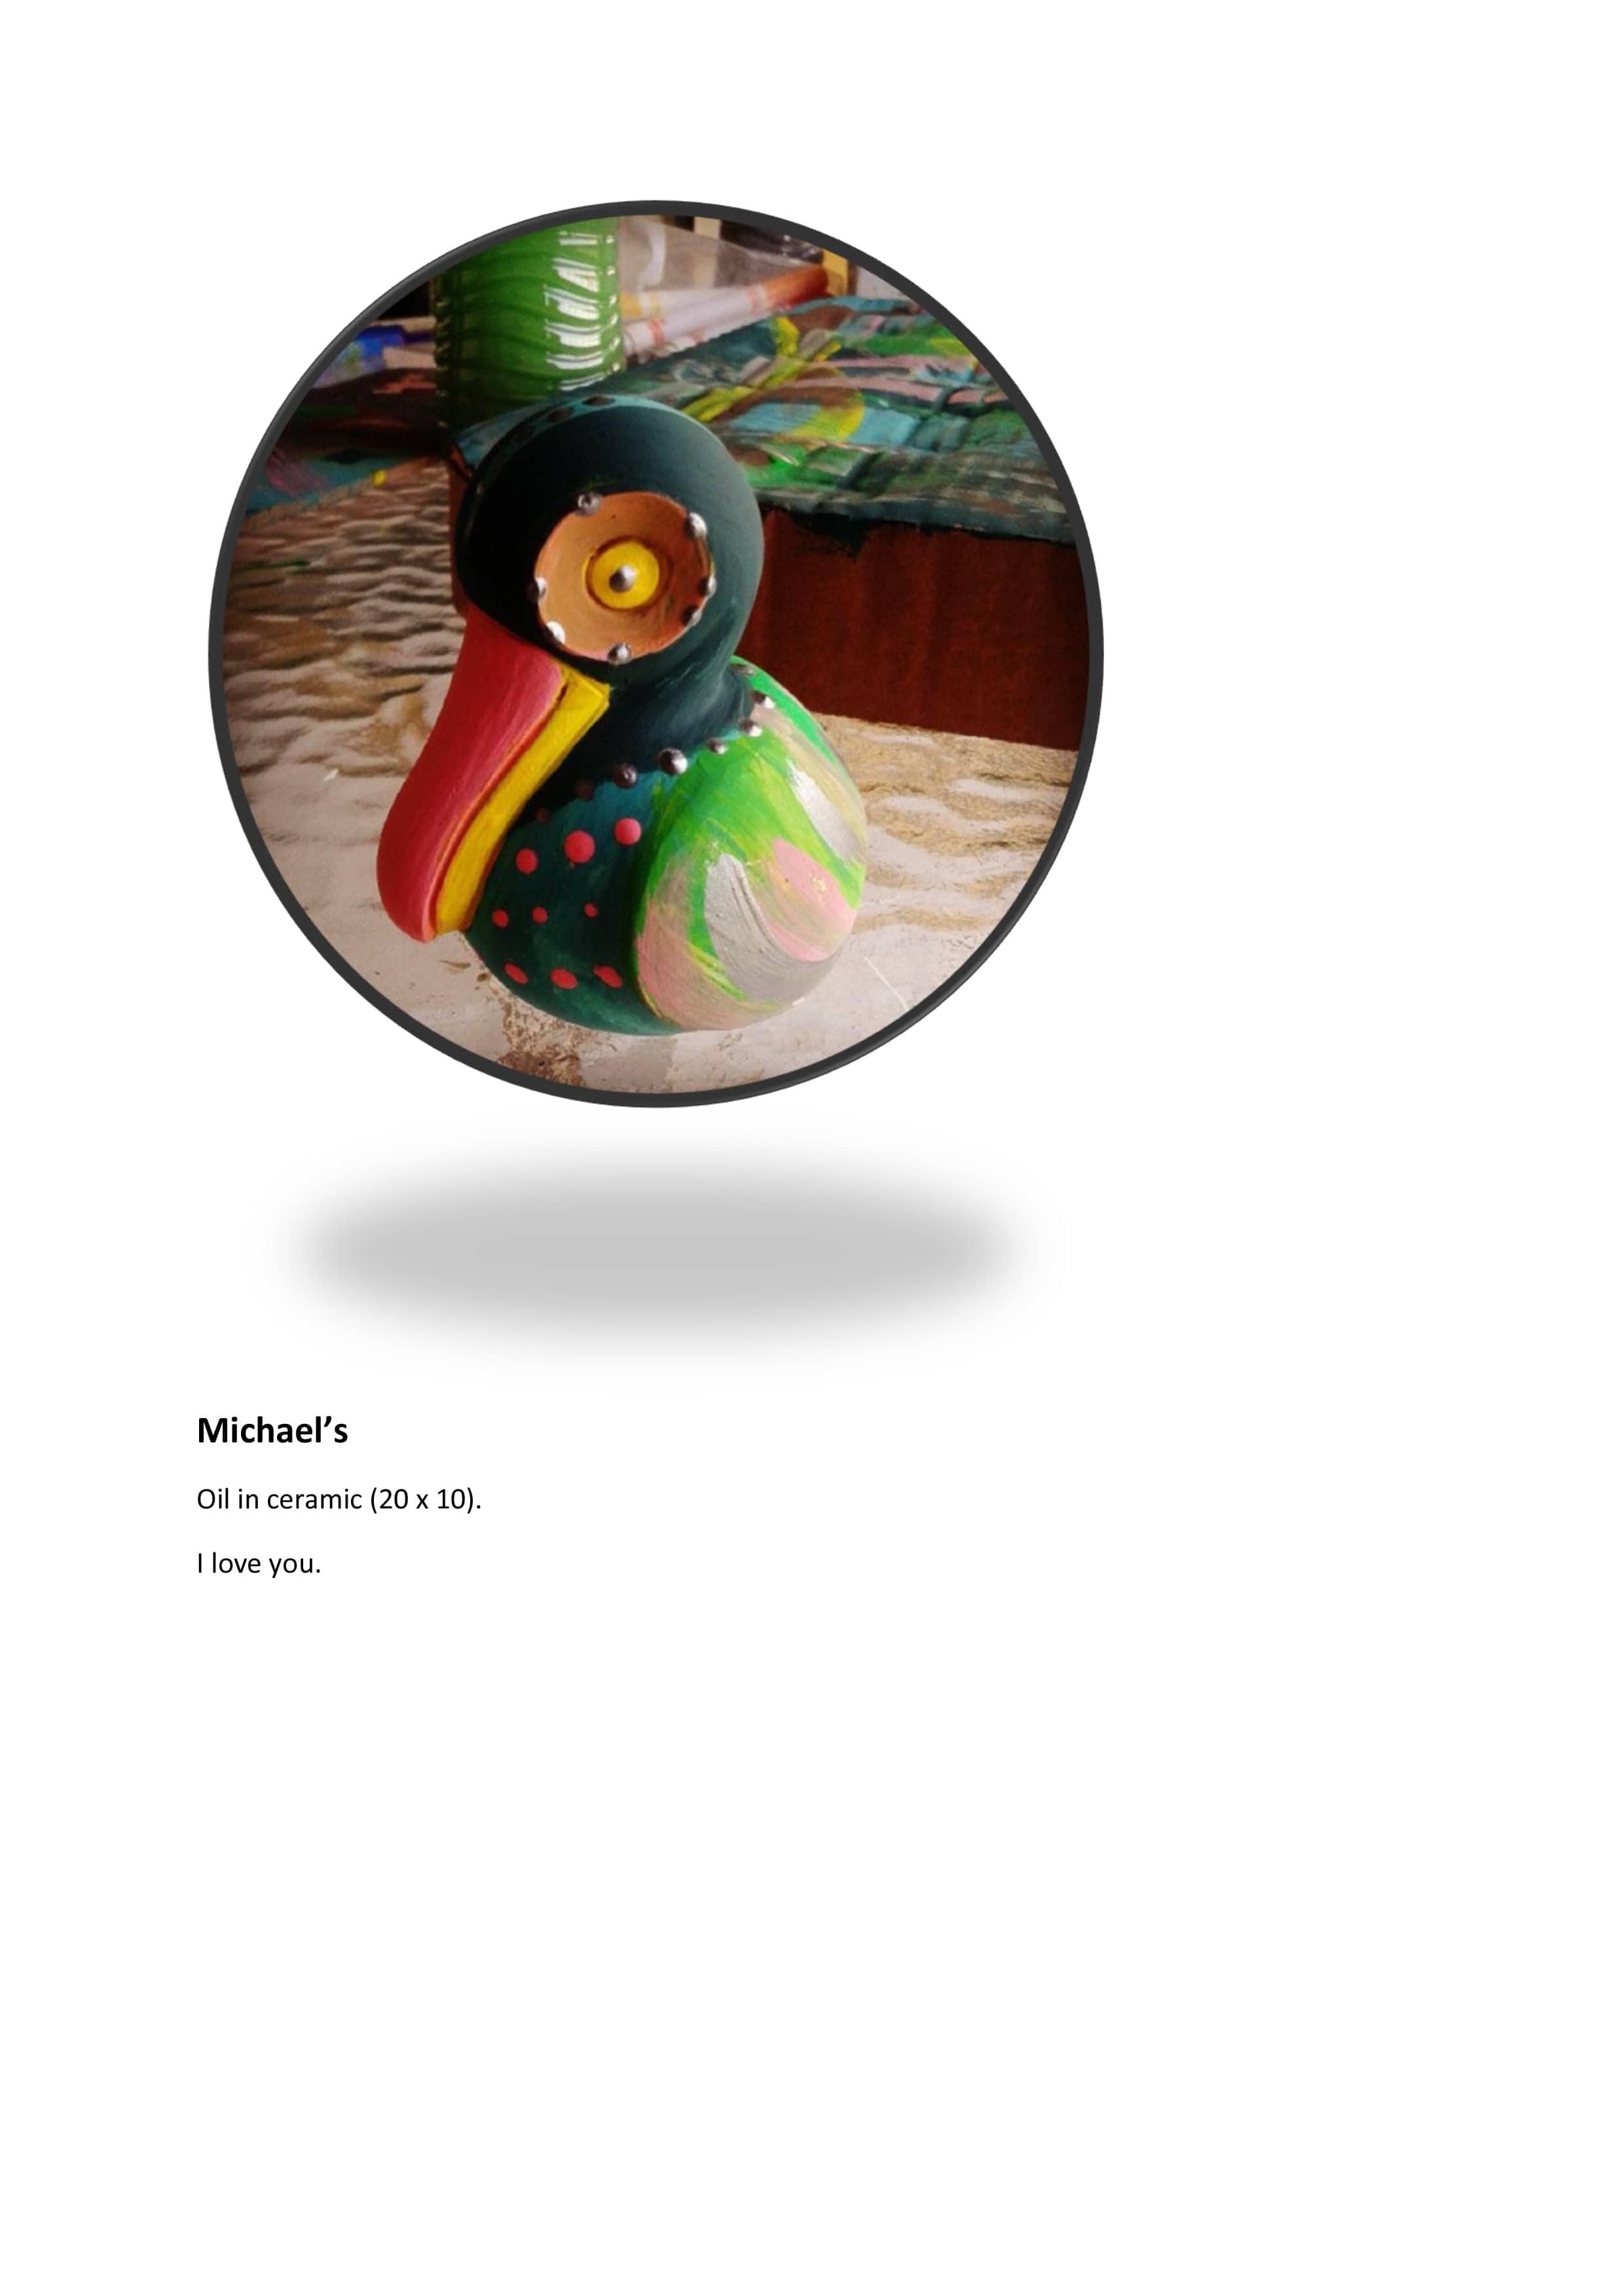 art-portfolio-aglae-corrected-15-min.jpg